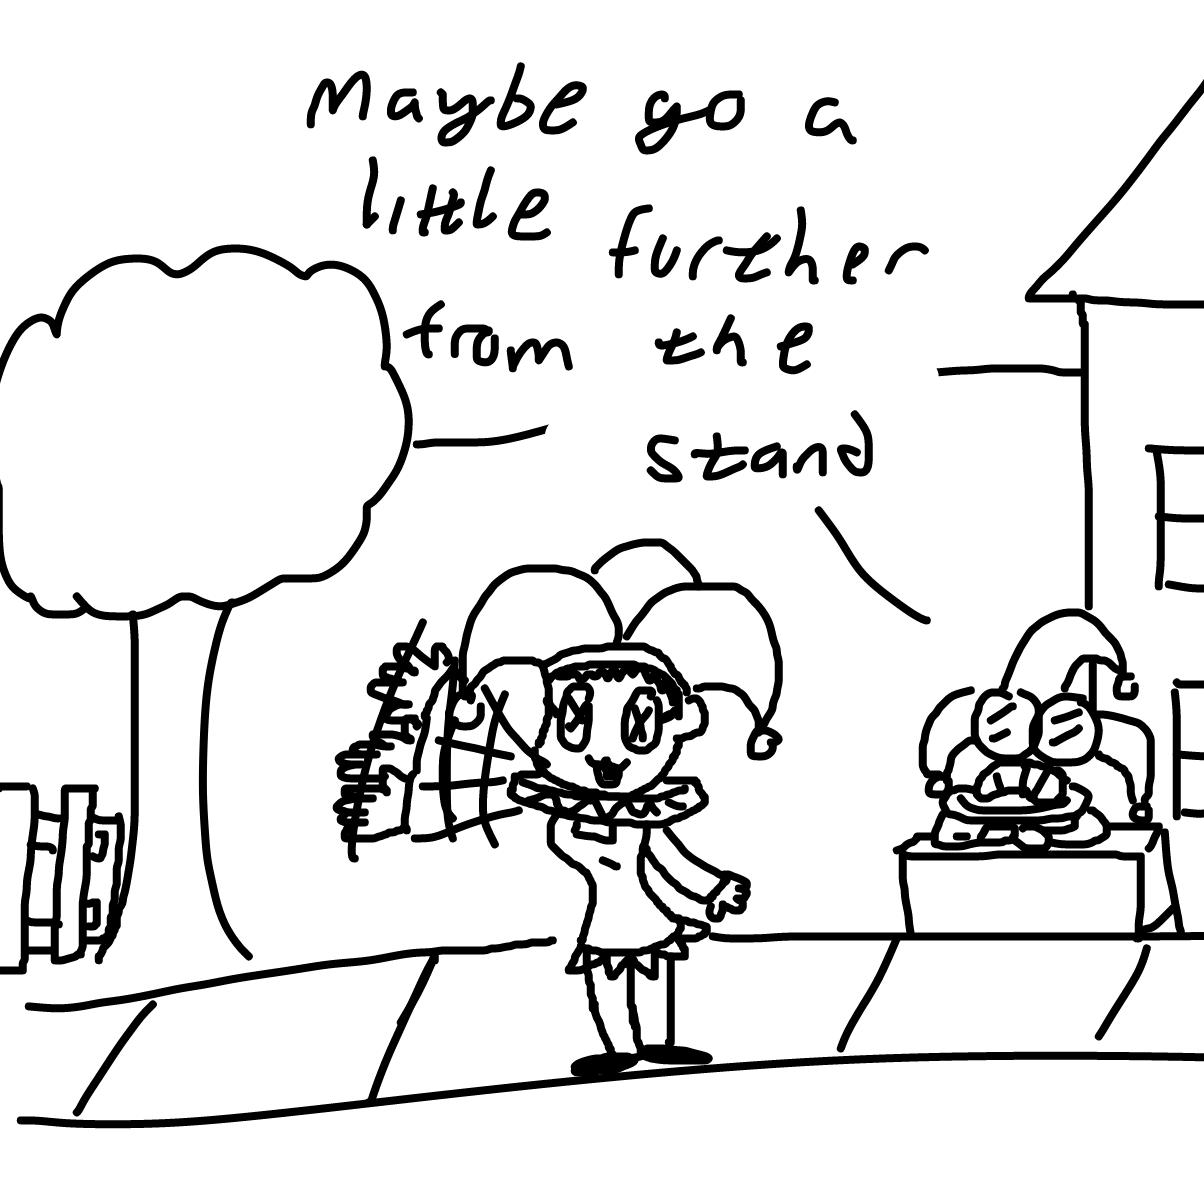 Drawing in Reeling em in by CherryFlavored